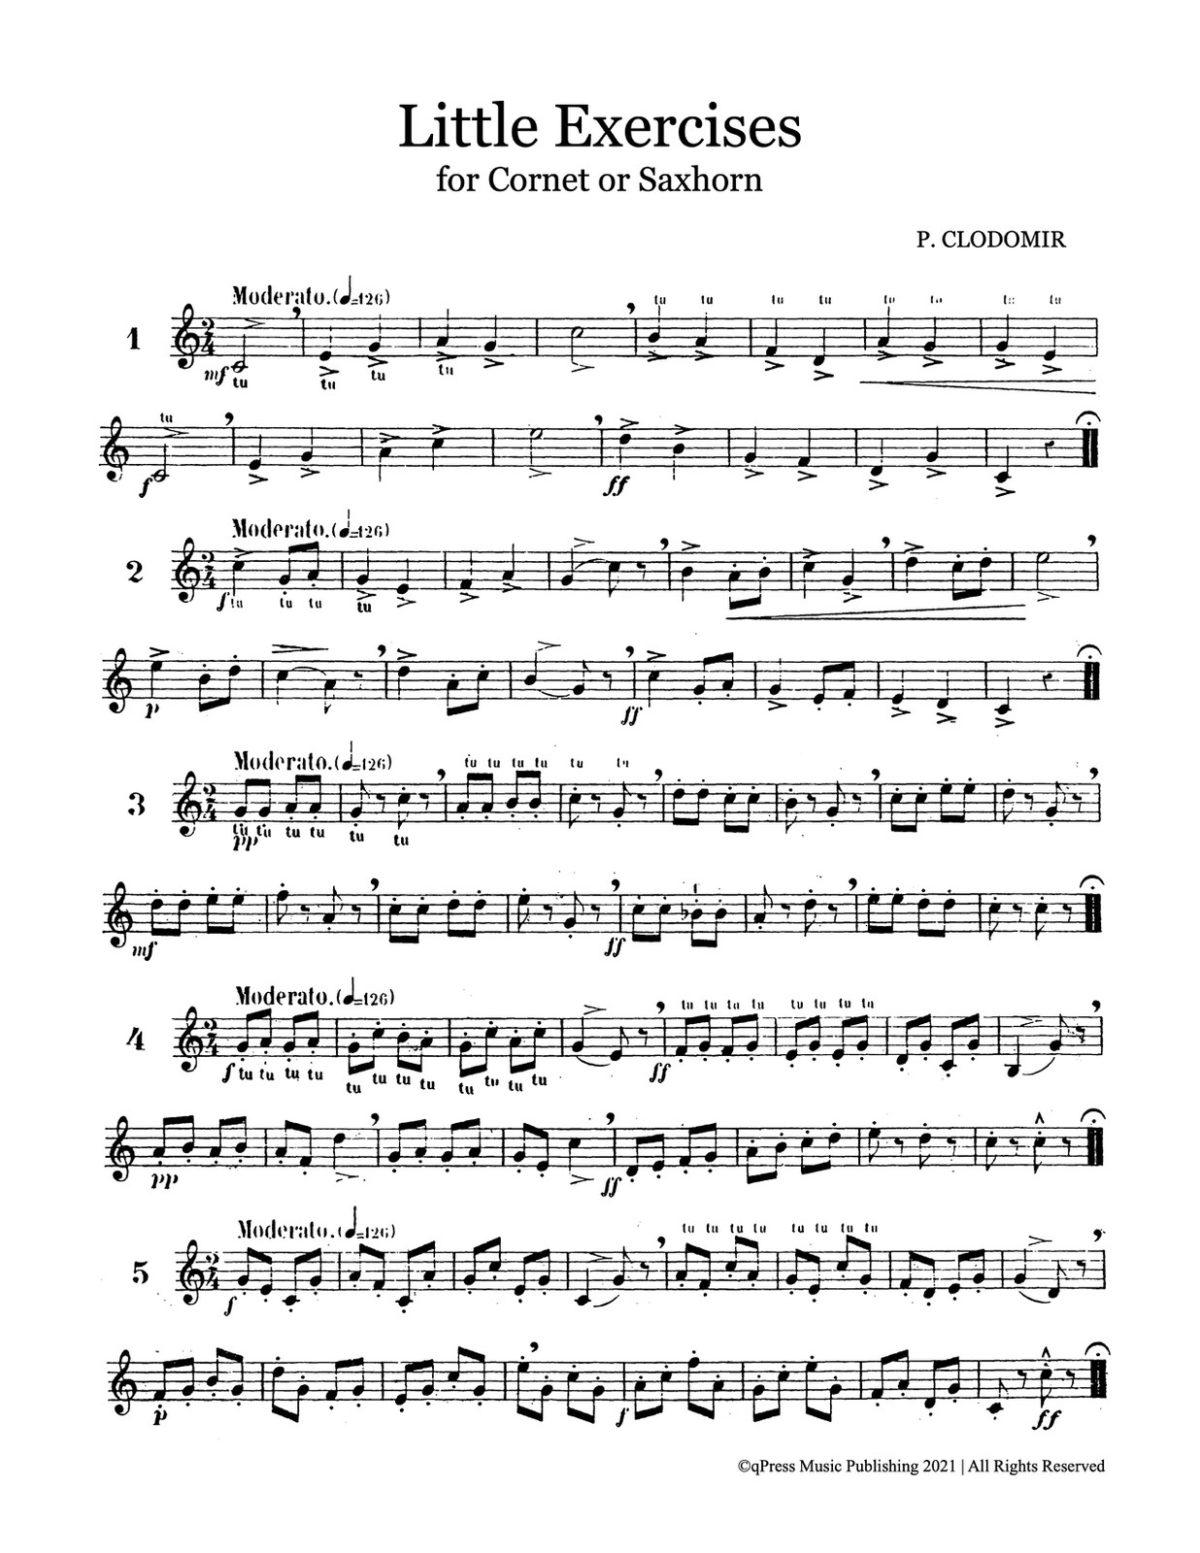 Clodomir, Modern Trumpet School 1, Little Exercises-p03